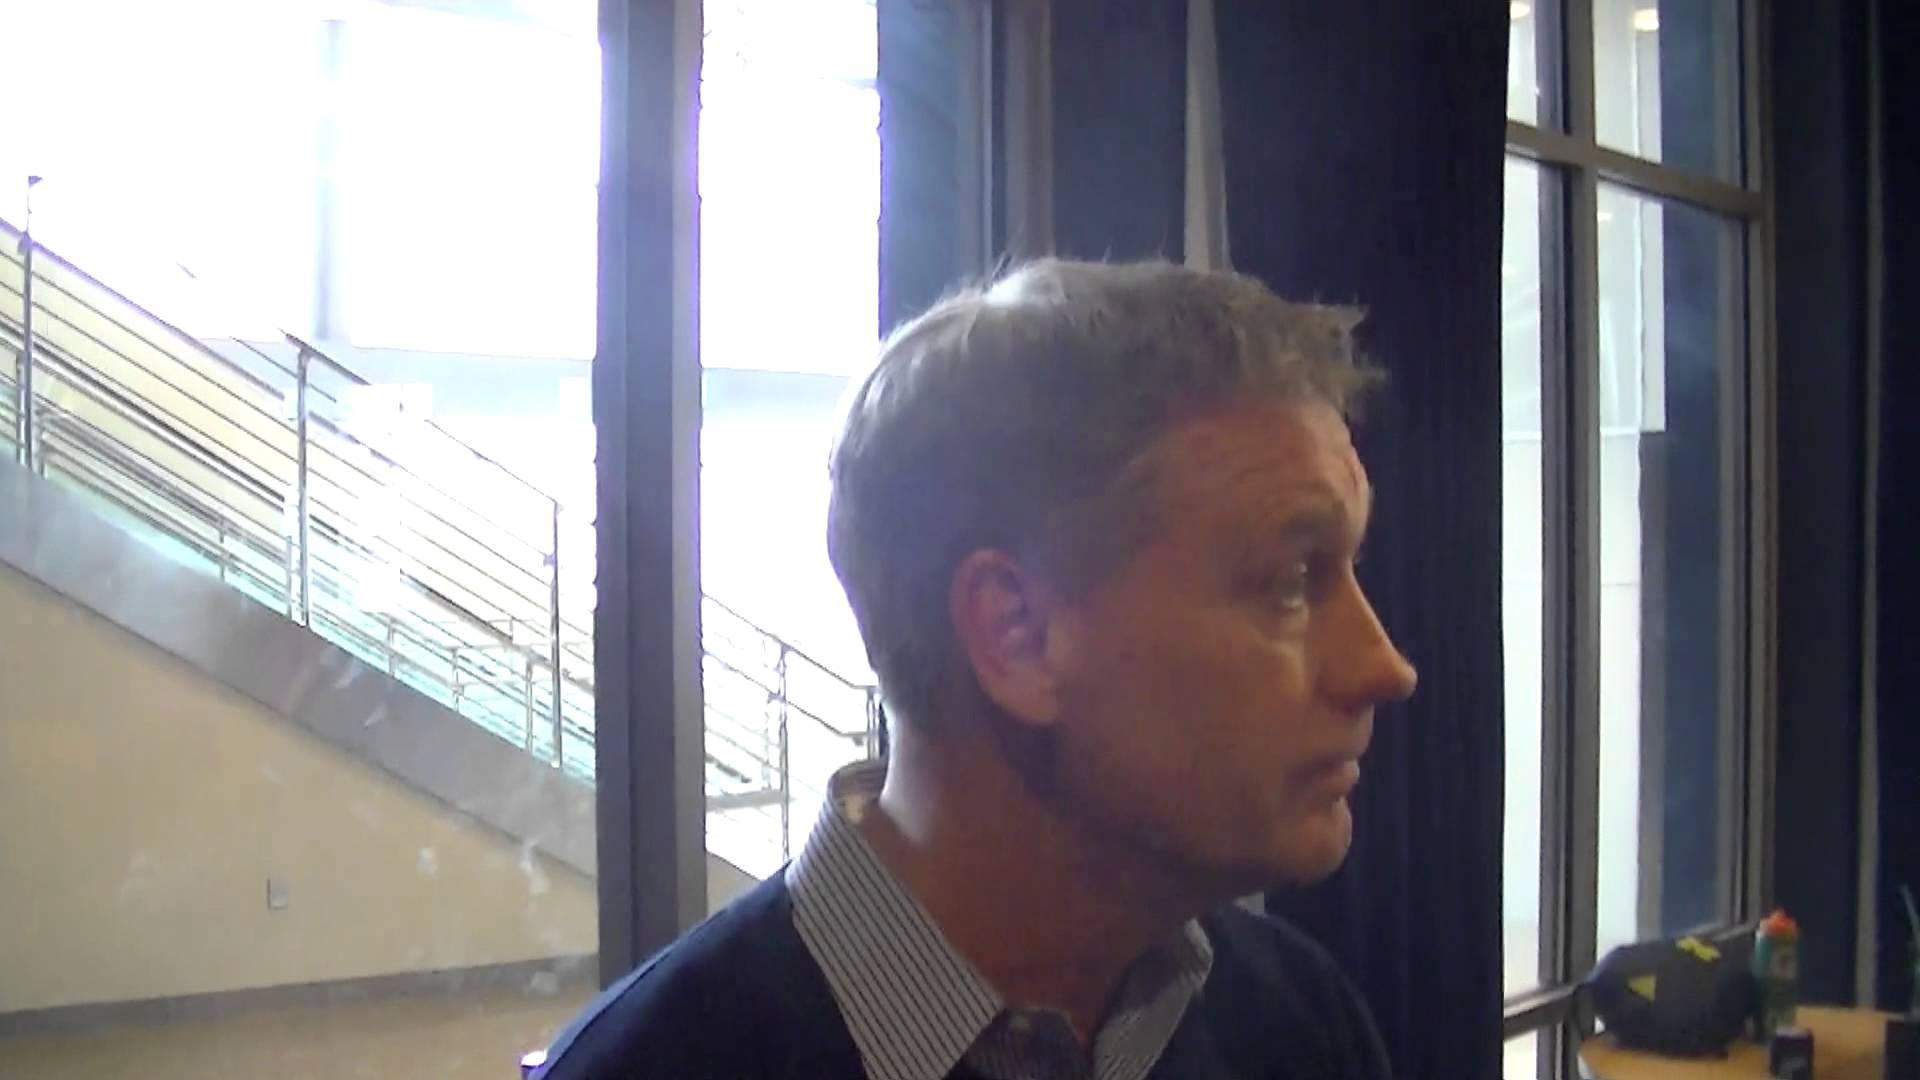 Video: Jeff Meyer, LaVall Jordan on Tim Hardaway Jr.'s decision to enter the NBA draft